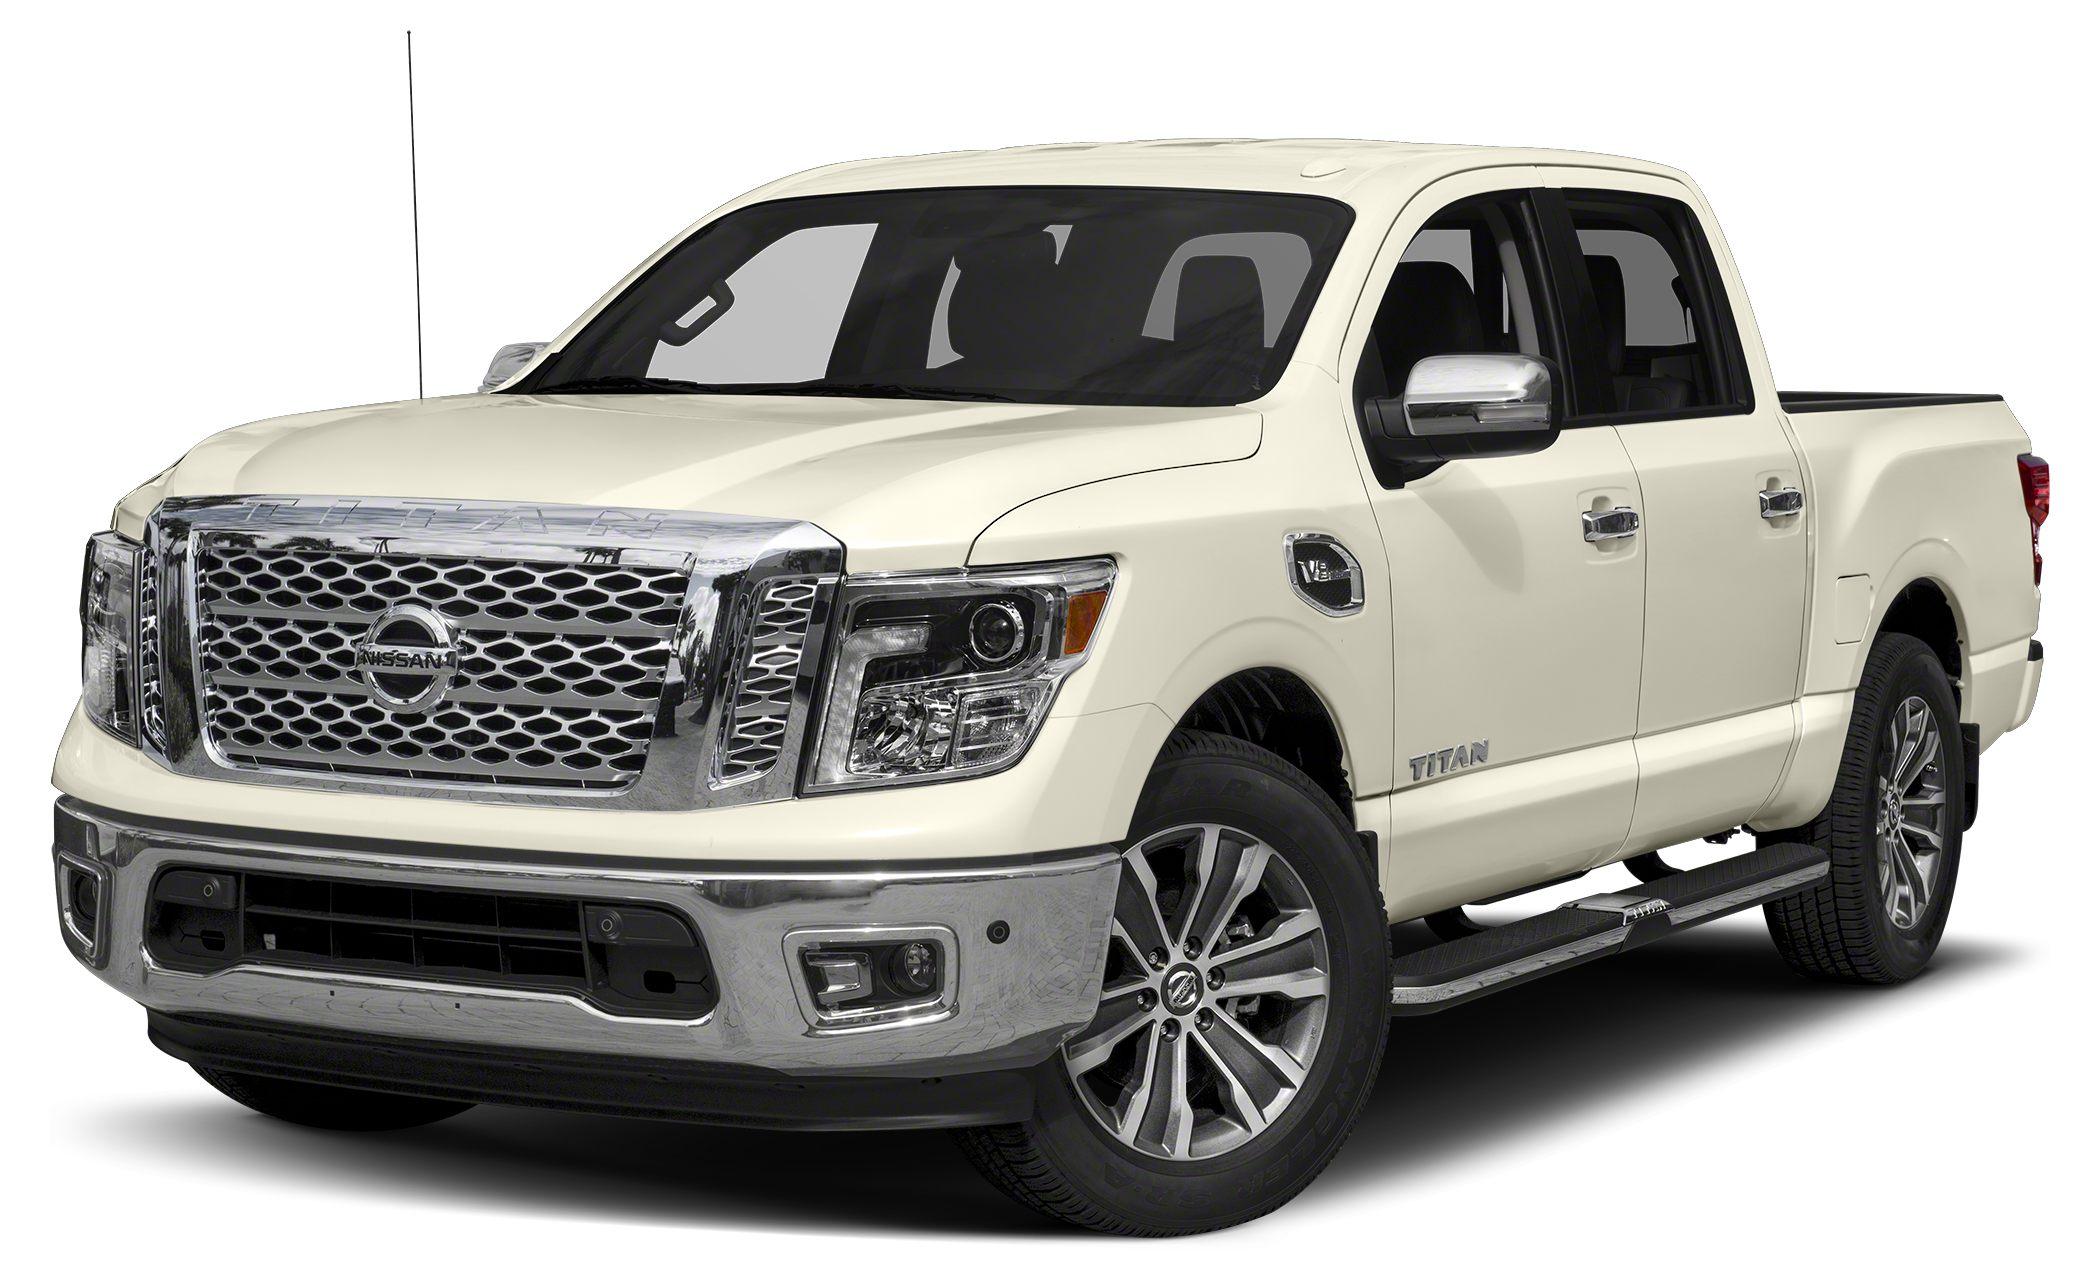 2017 Nissan Titan SL Miles 8Color White Stock 7170641 VIN 1N6AA1E52HN556740